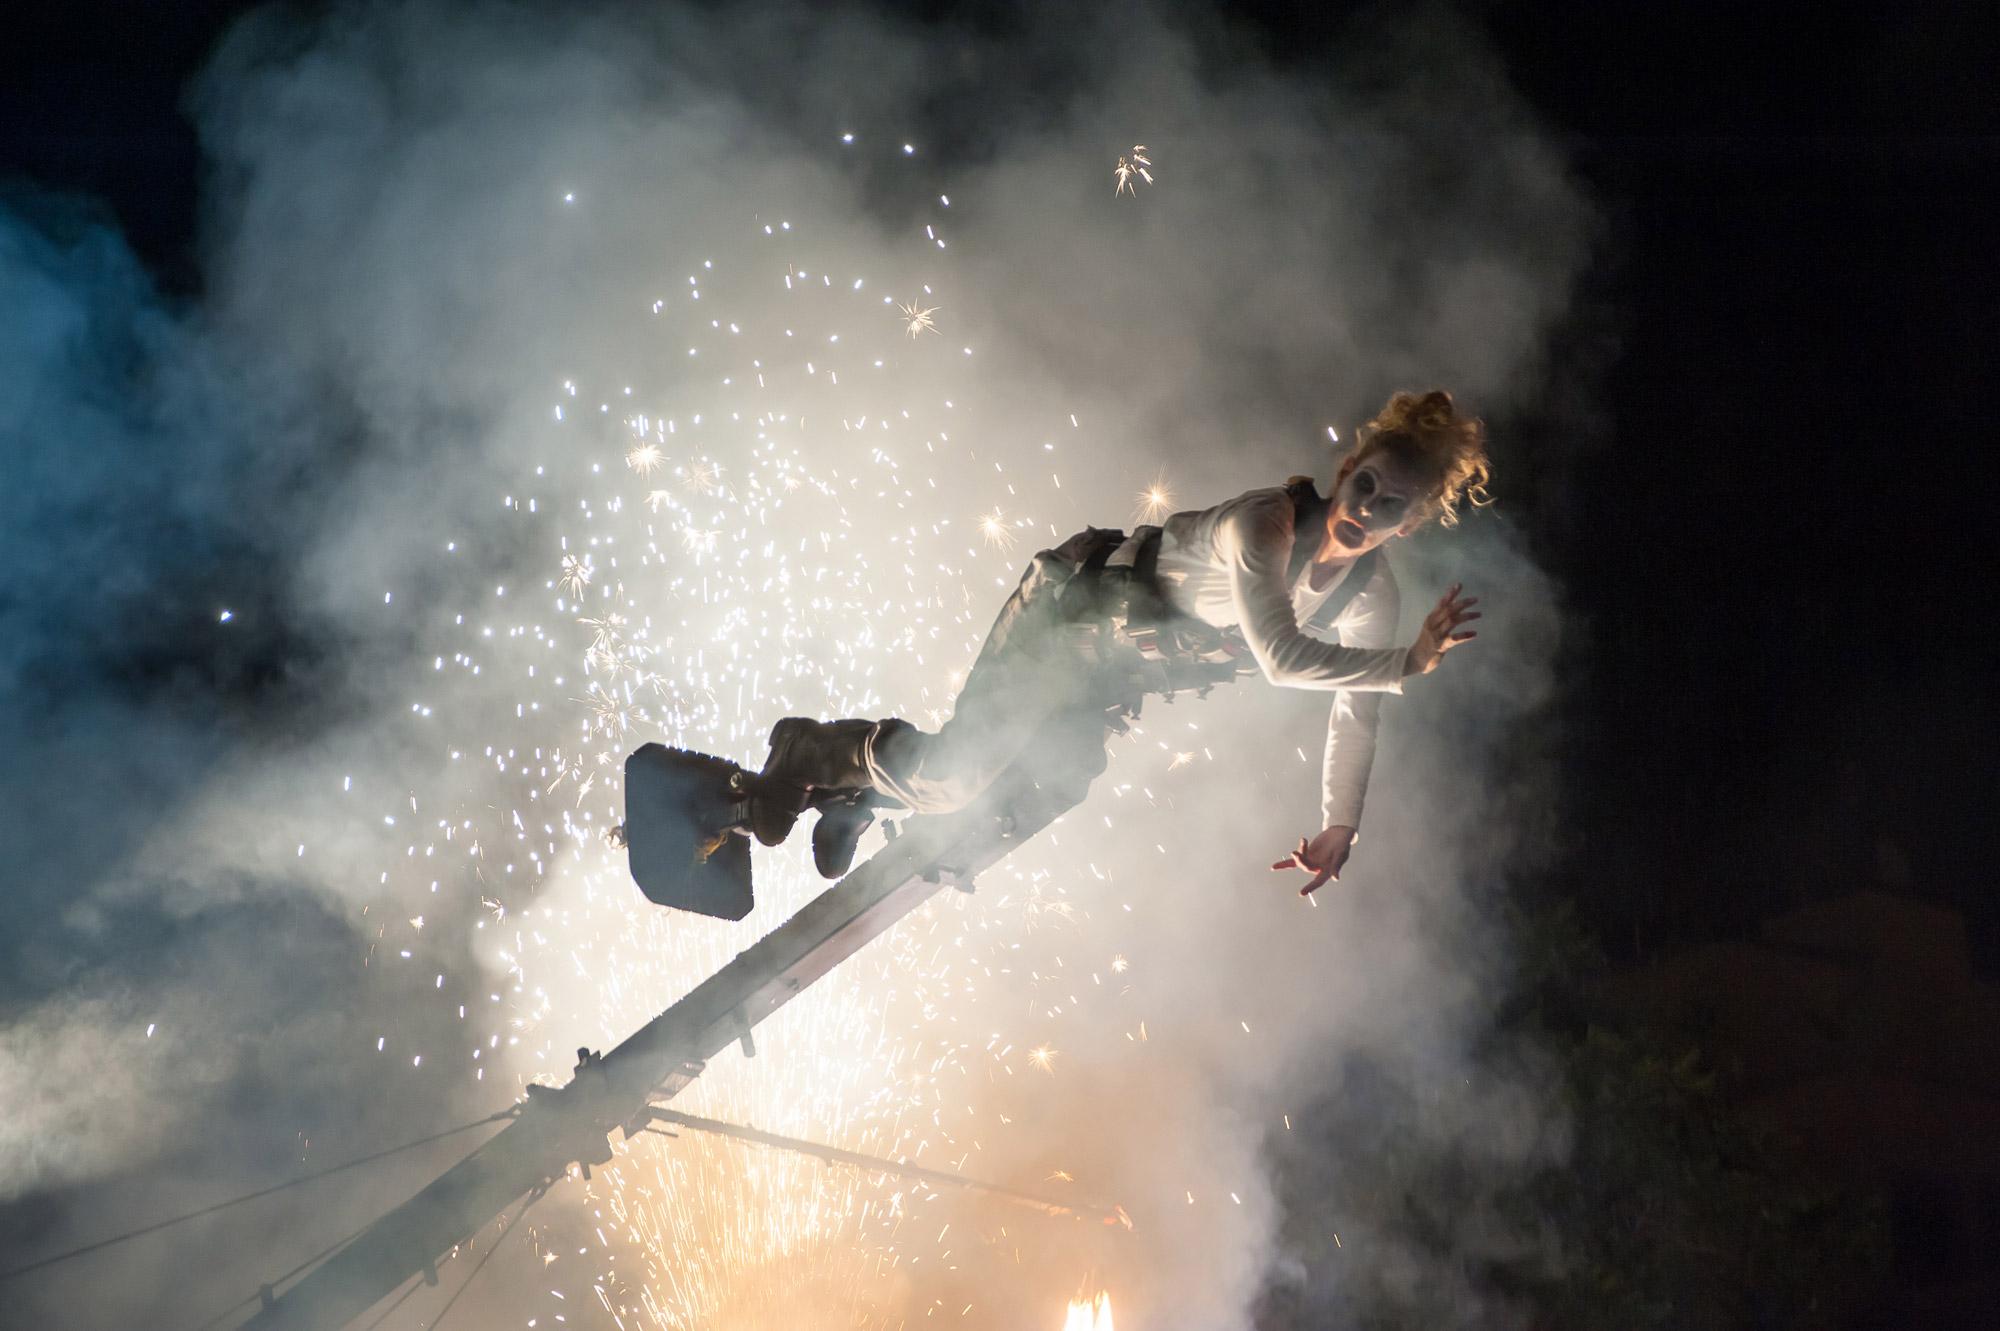 Las Palmas de Gran Canaria, Temudas Festival, PAN.OPTIKUM, TRANSITion, Platzinszenierung, Sigrun Fritsch, Pyrotechnik, Klaus Ulrich, Matthias Rettner